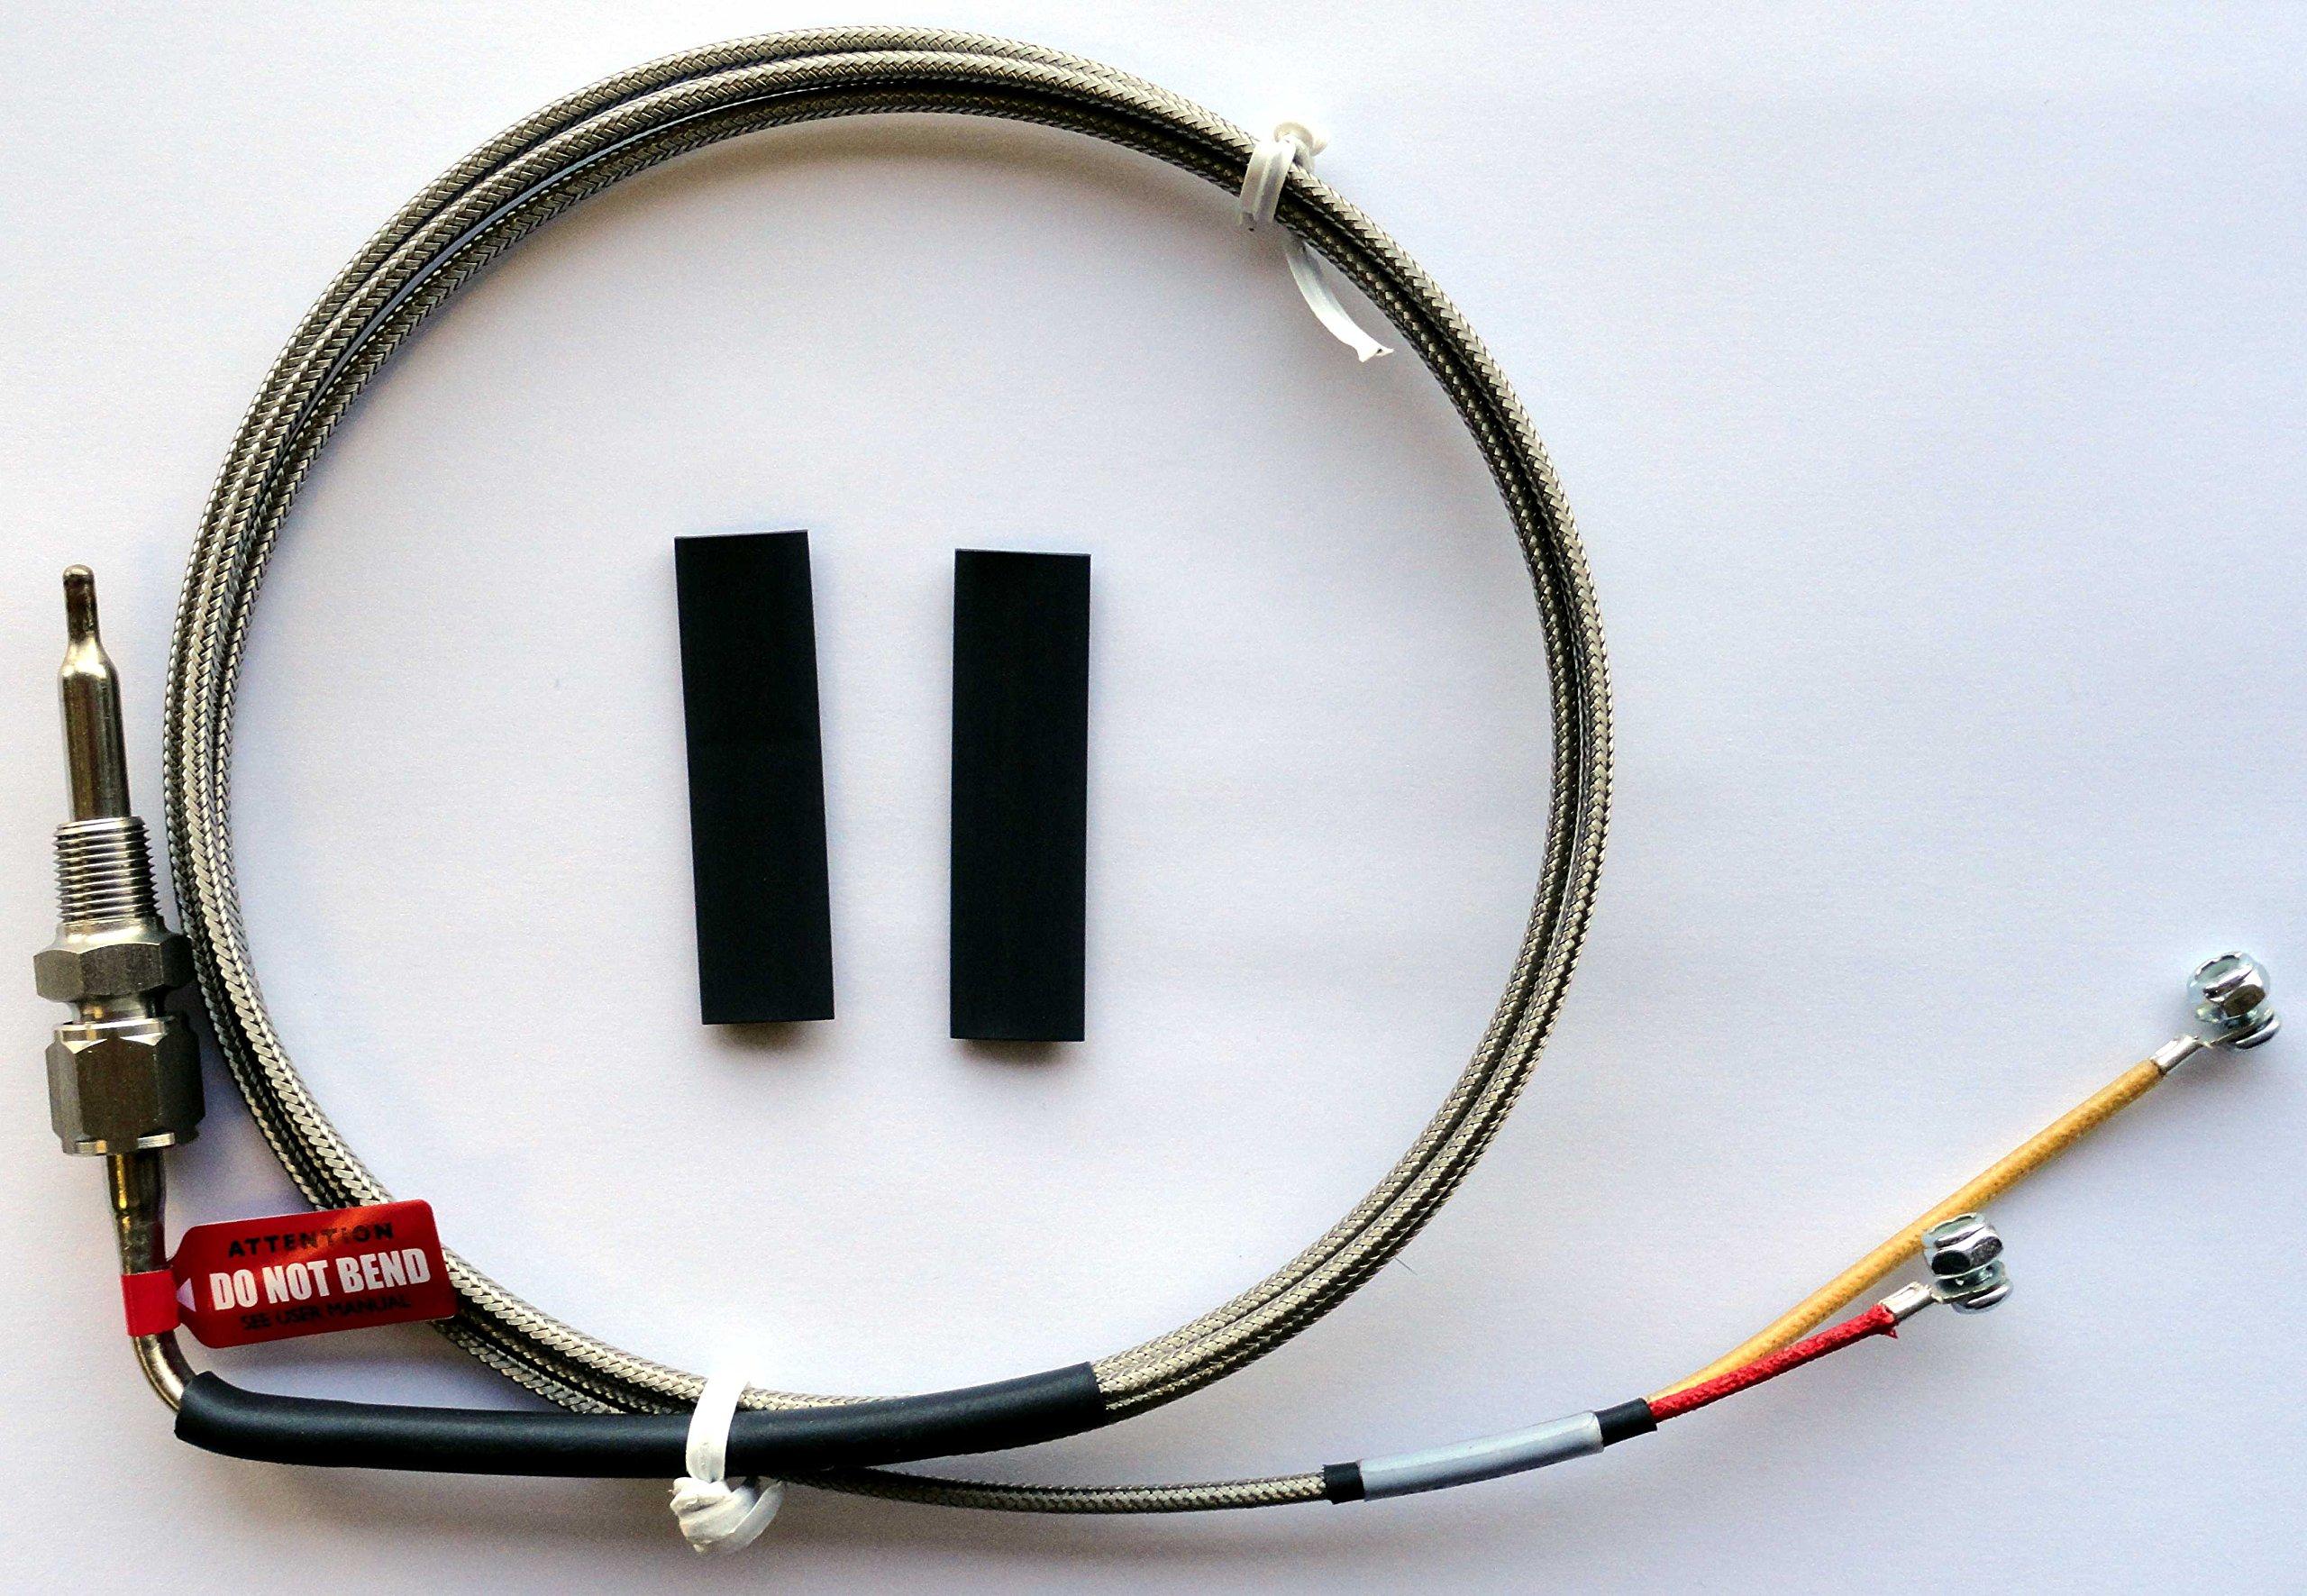 TruckMeter Edge 98900, 4000800 Thermocouple